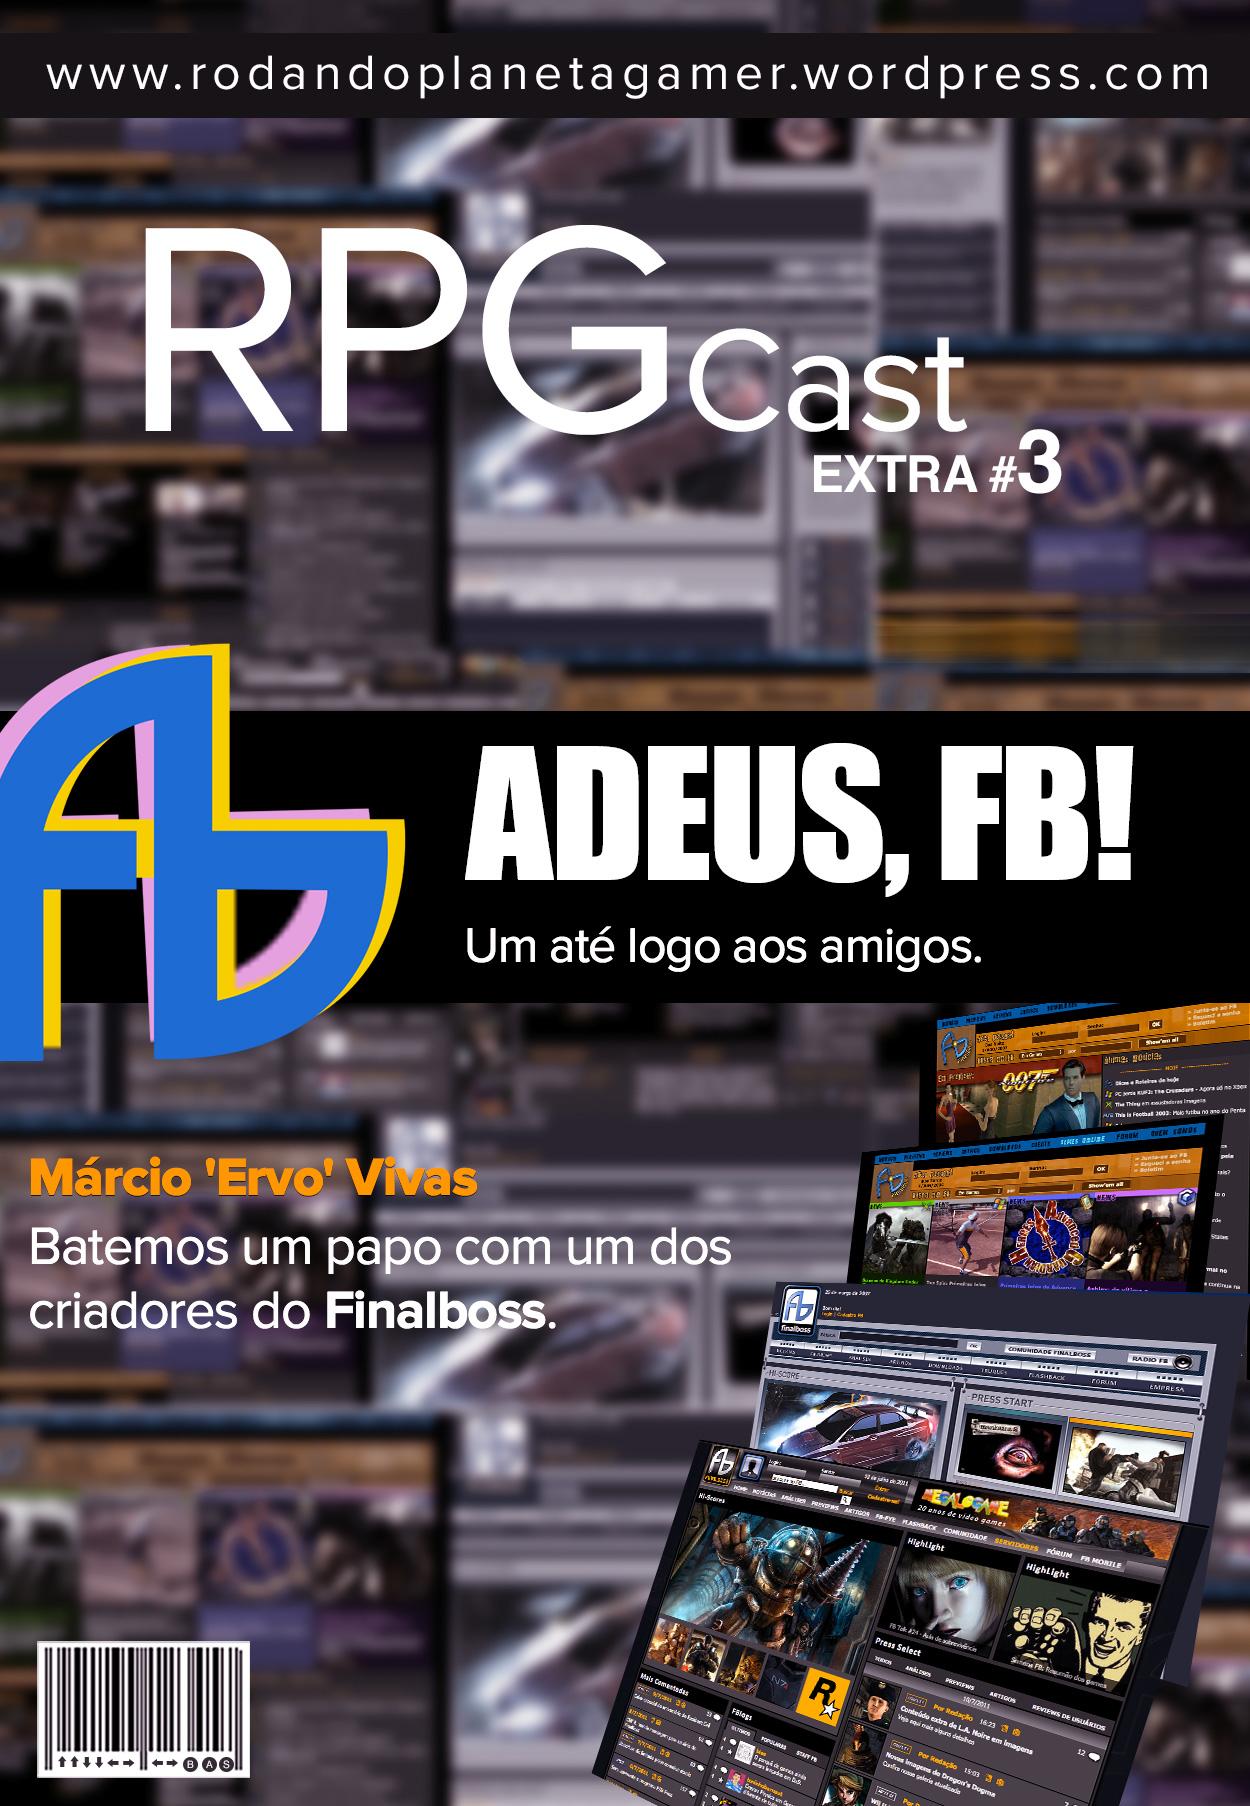 Rodando Planeta Gamer | Extra #3